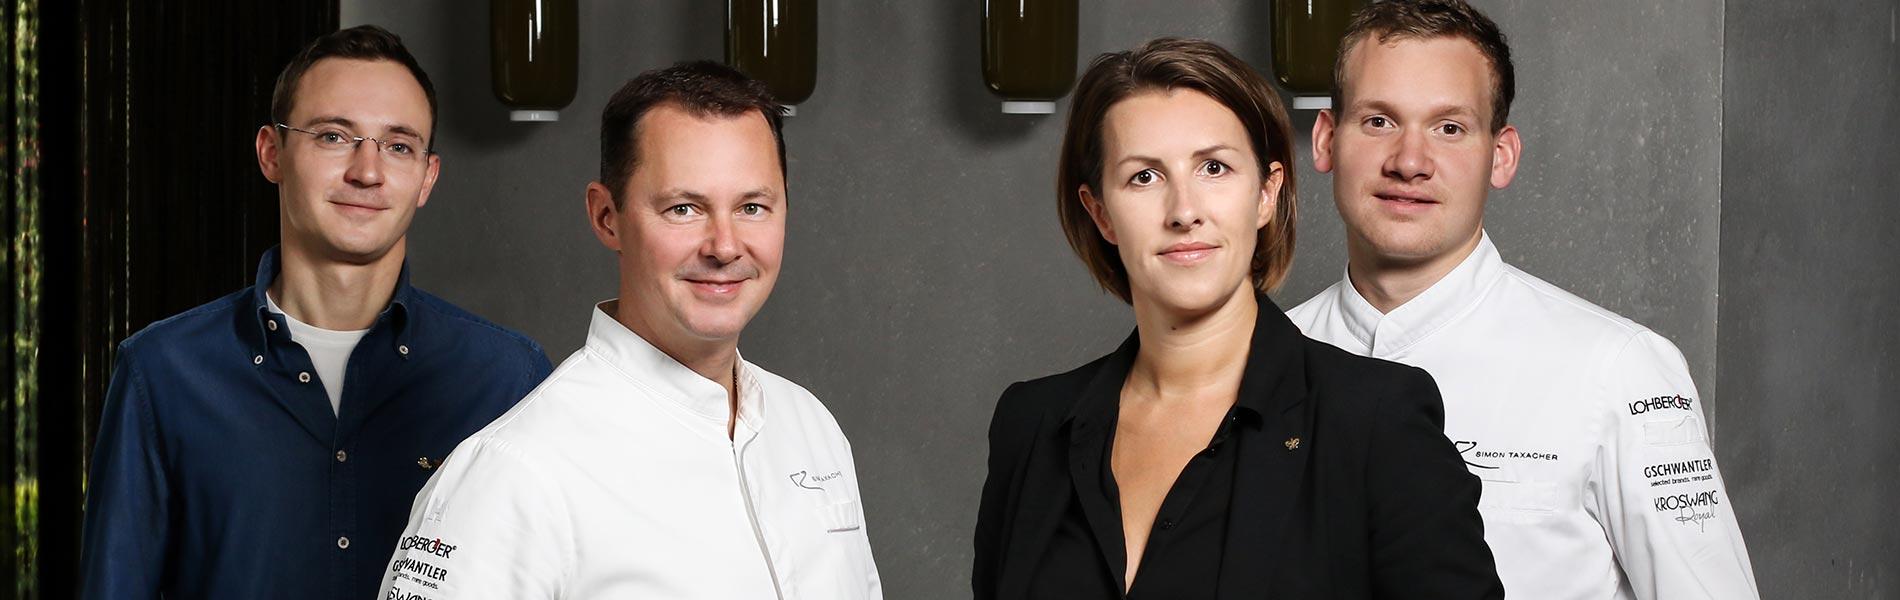 Management und Team Hotel Rosengarten 5 Sterne Hotel Relais & Châteaux Hotel Kirchberg Tirol Austria